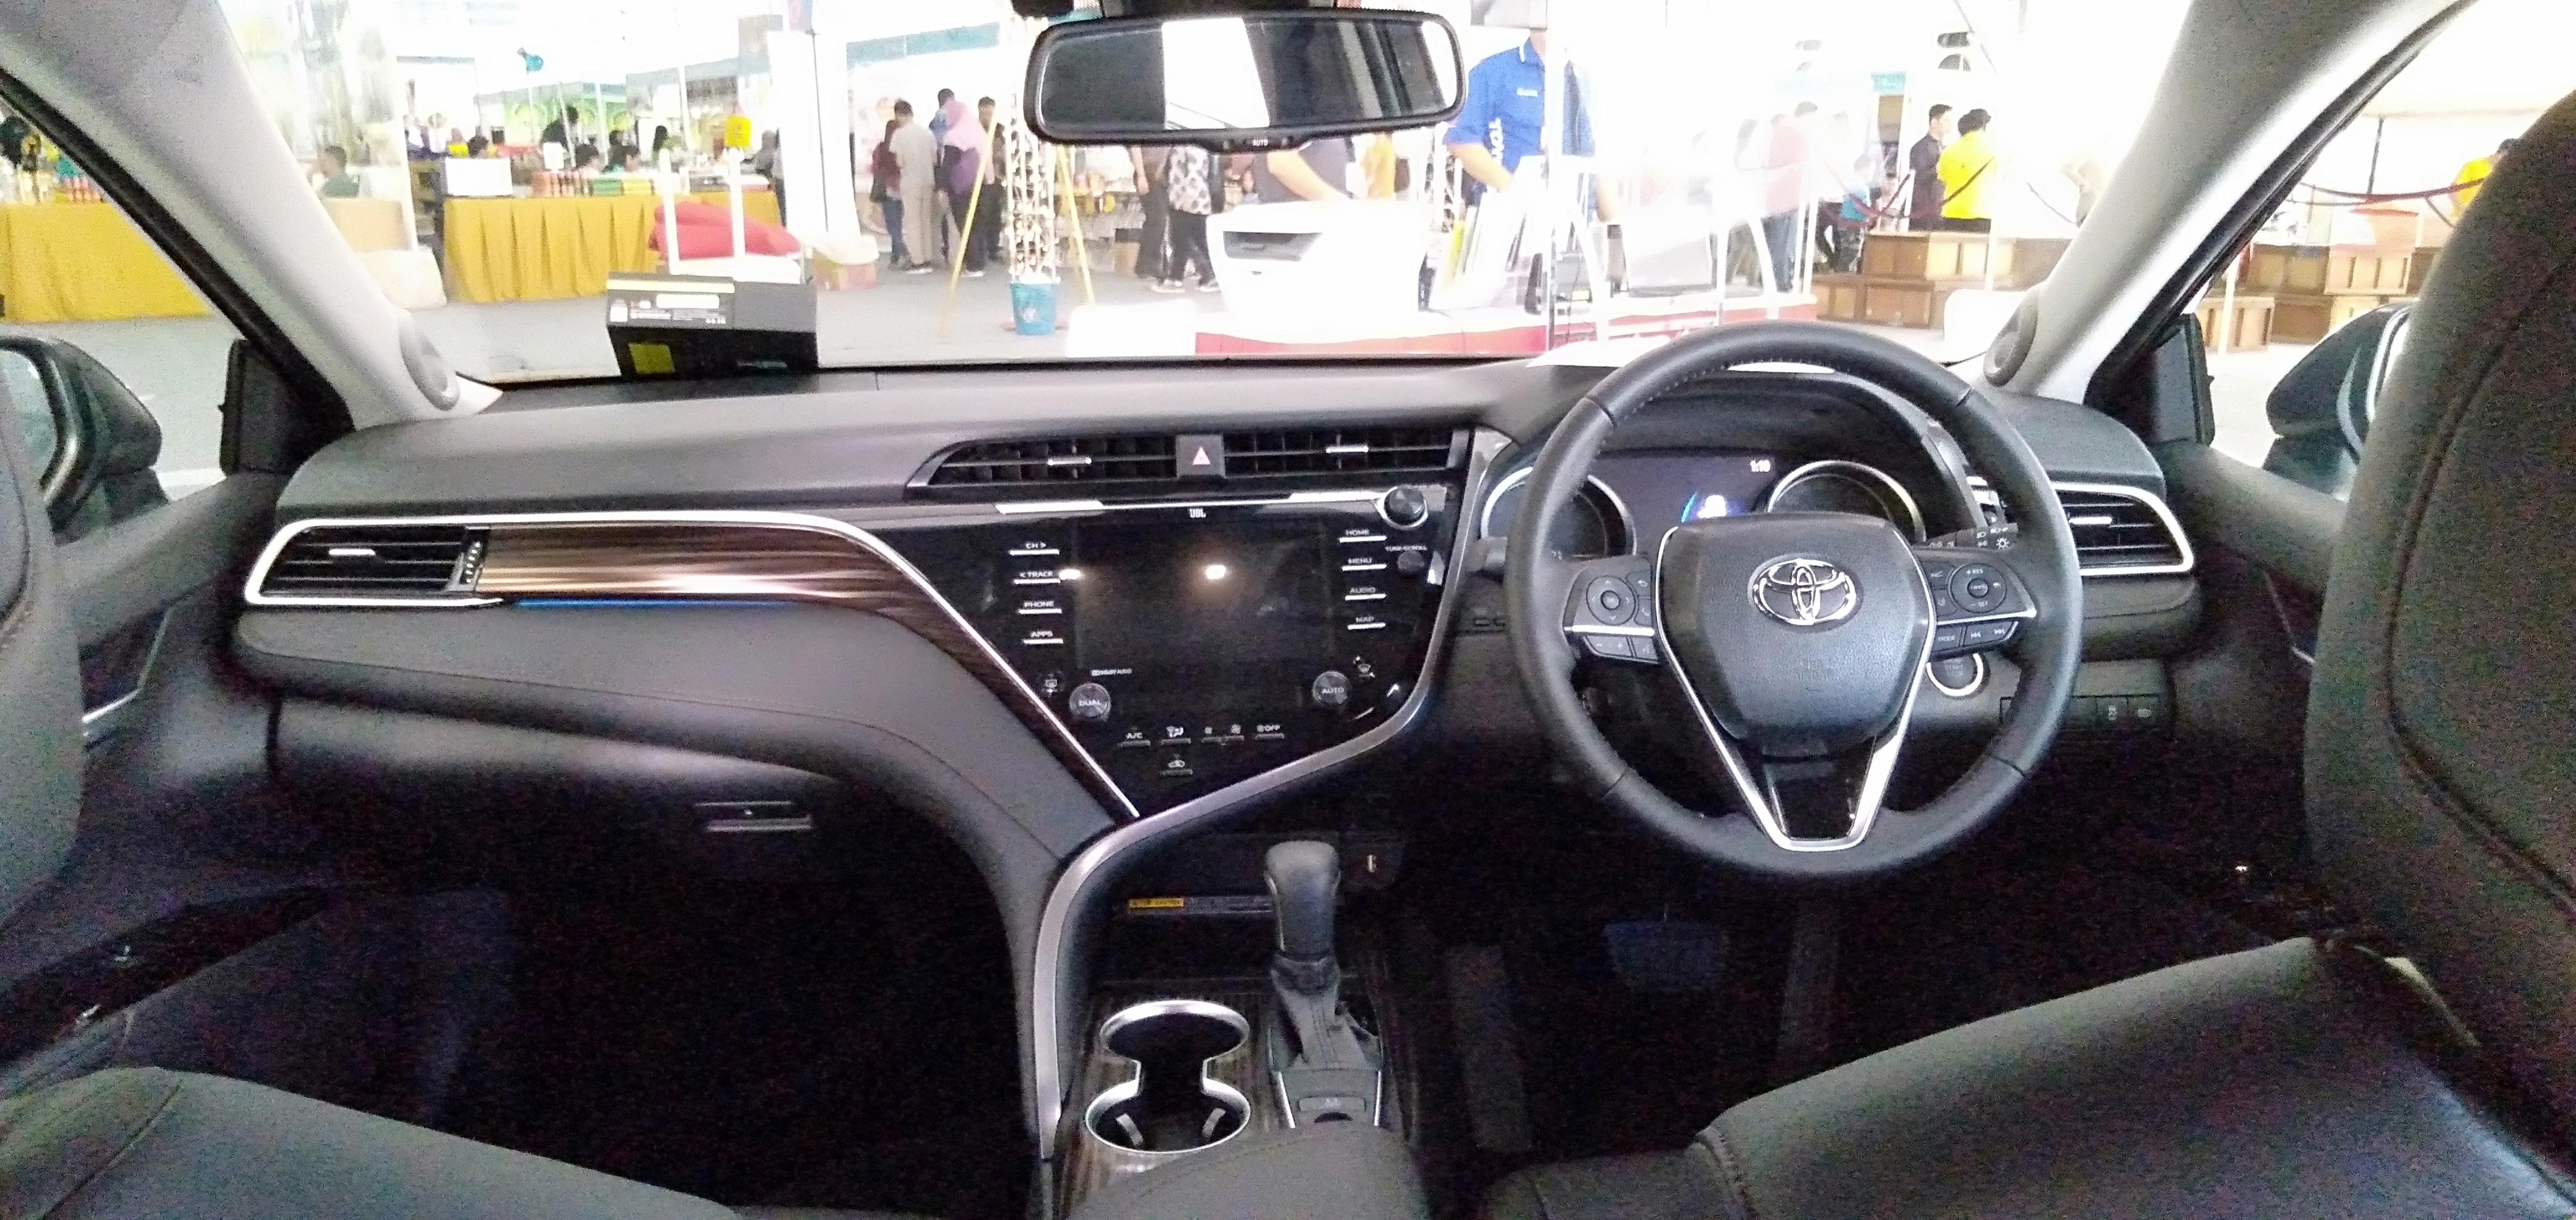 Toyota Camry Interior >> File 2020 Toyota Camry 2 5 Interior Jpg Wikimedia Commons